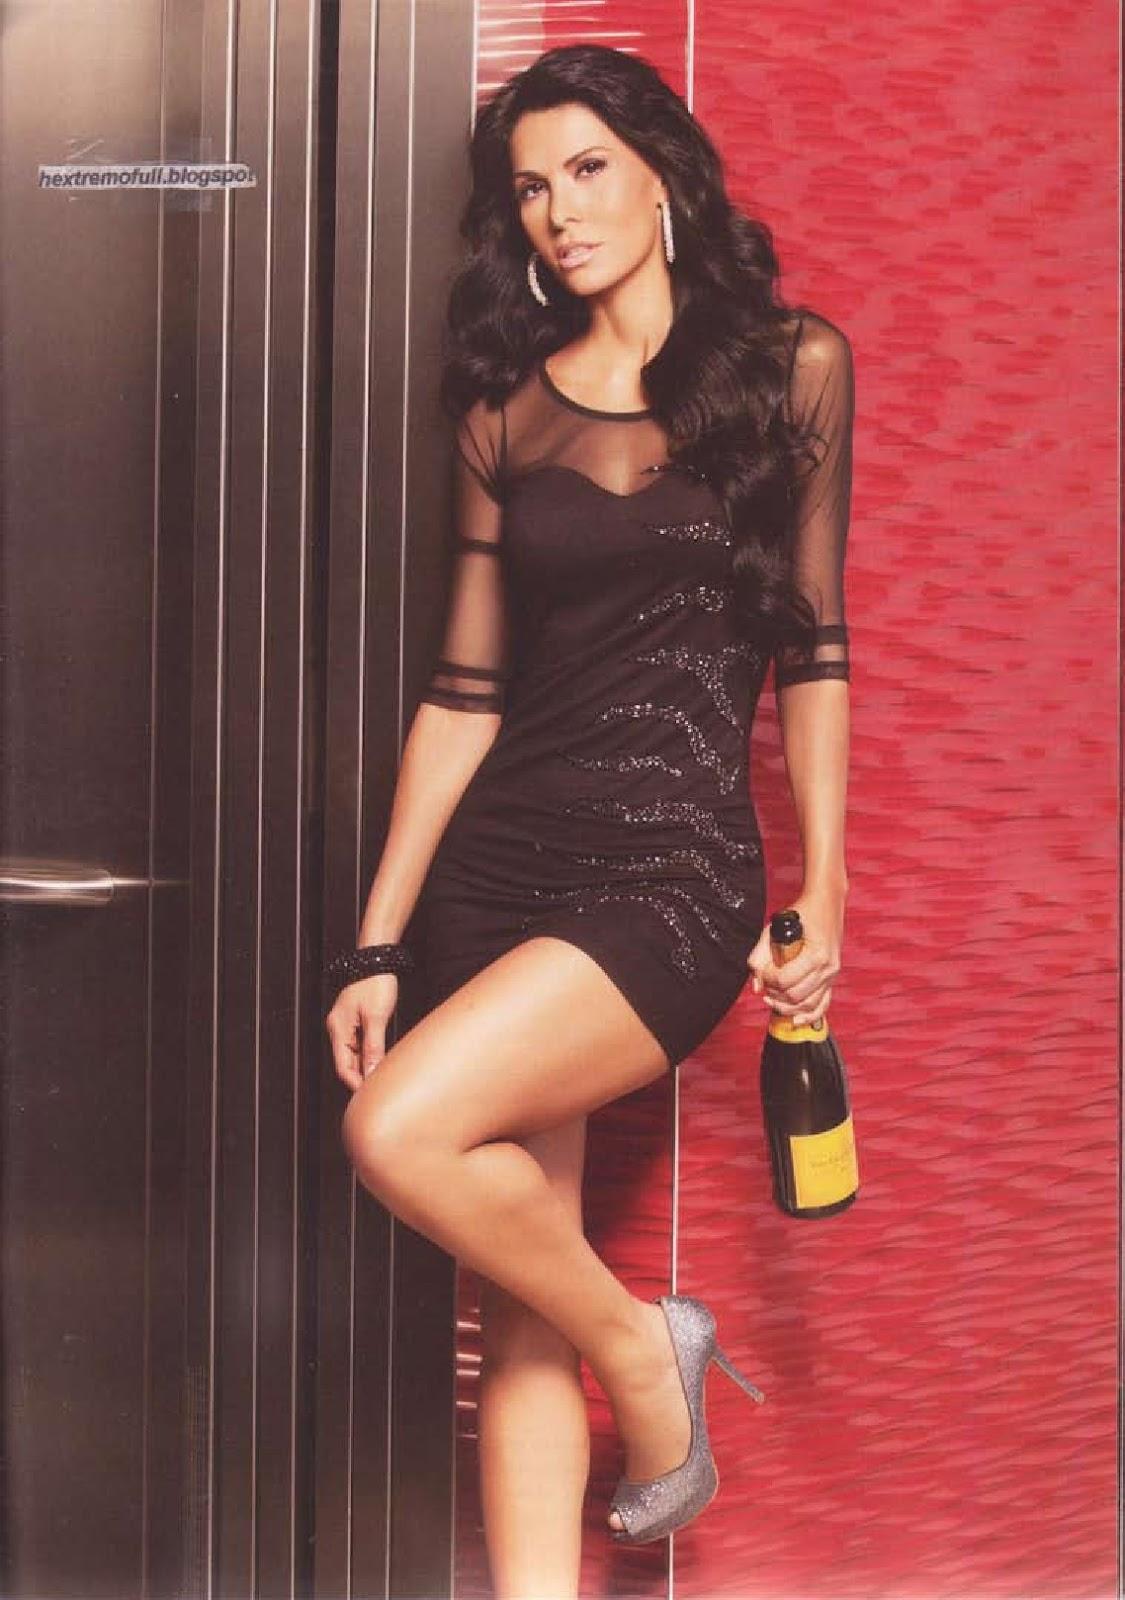 PHOTOSHOOT Tanya Vazquez - Revista H para hombres - YouTube